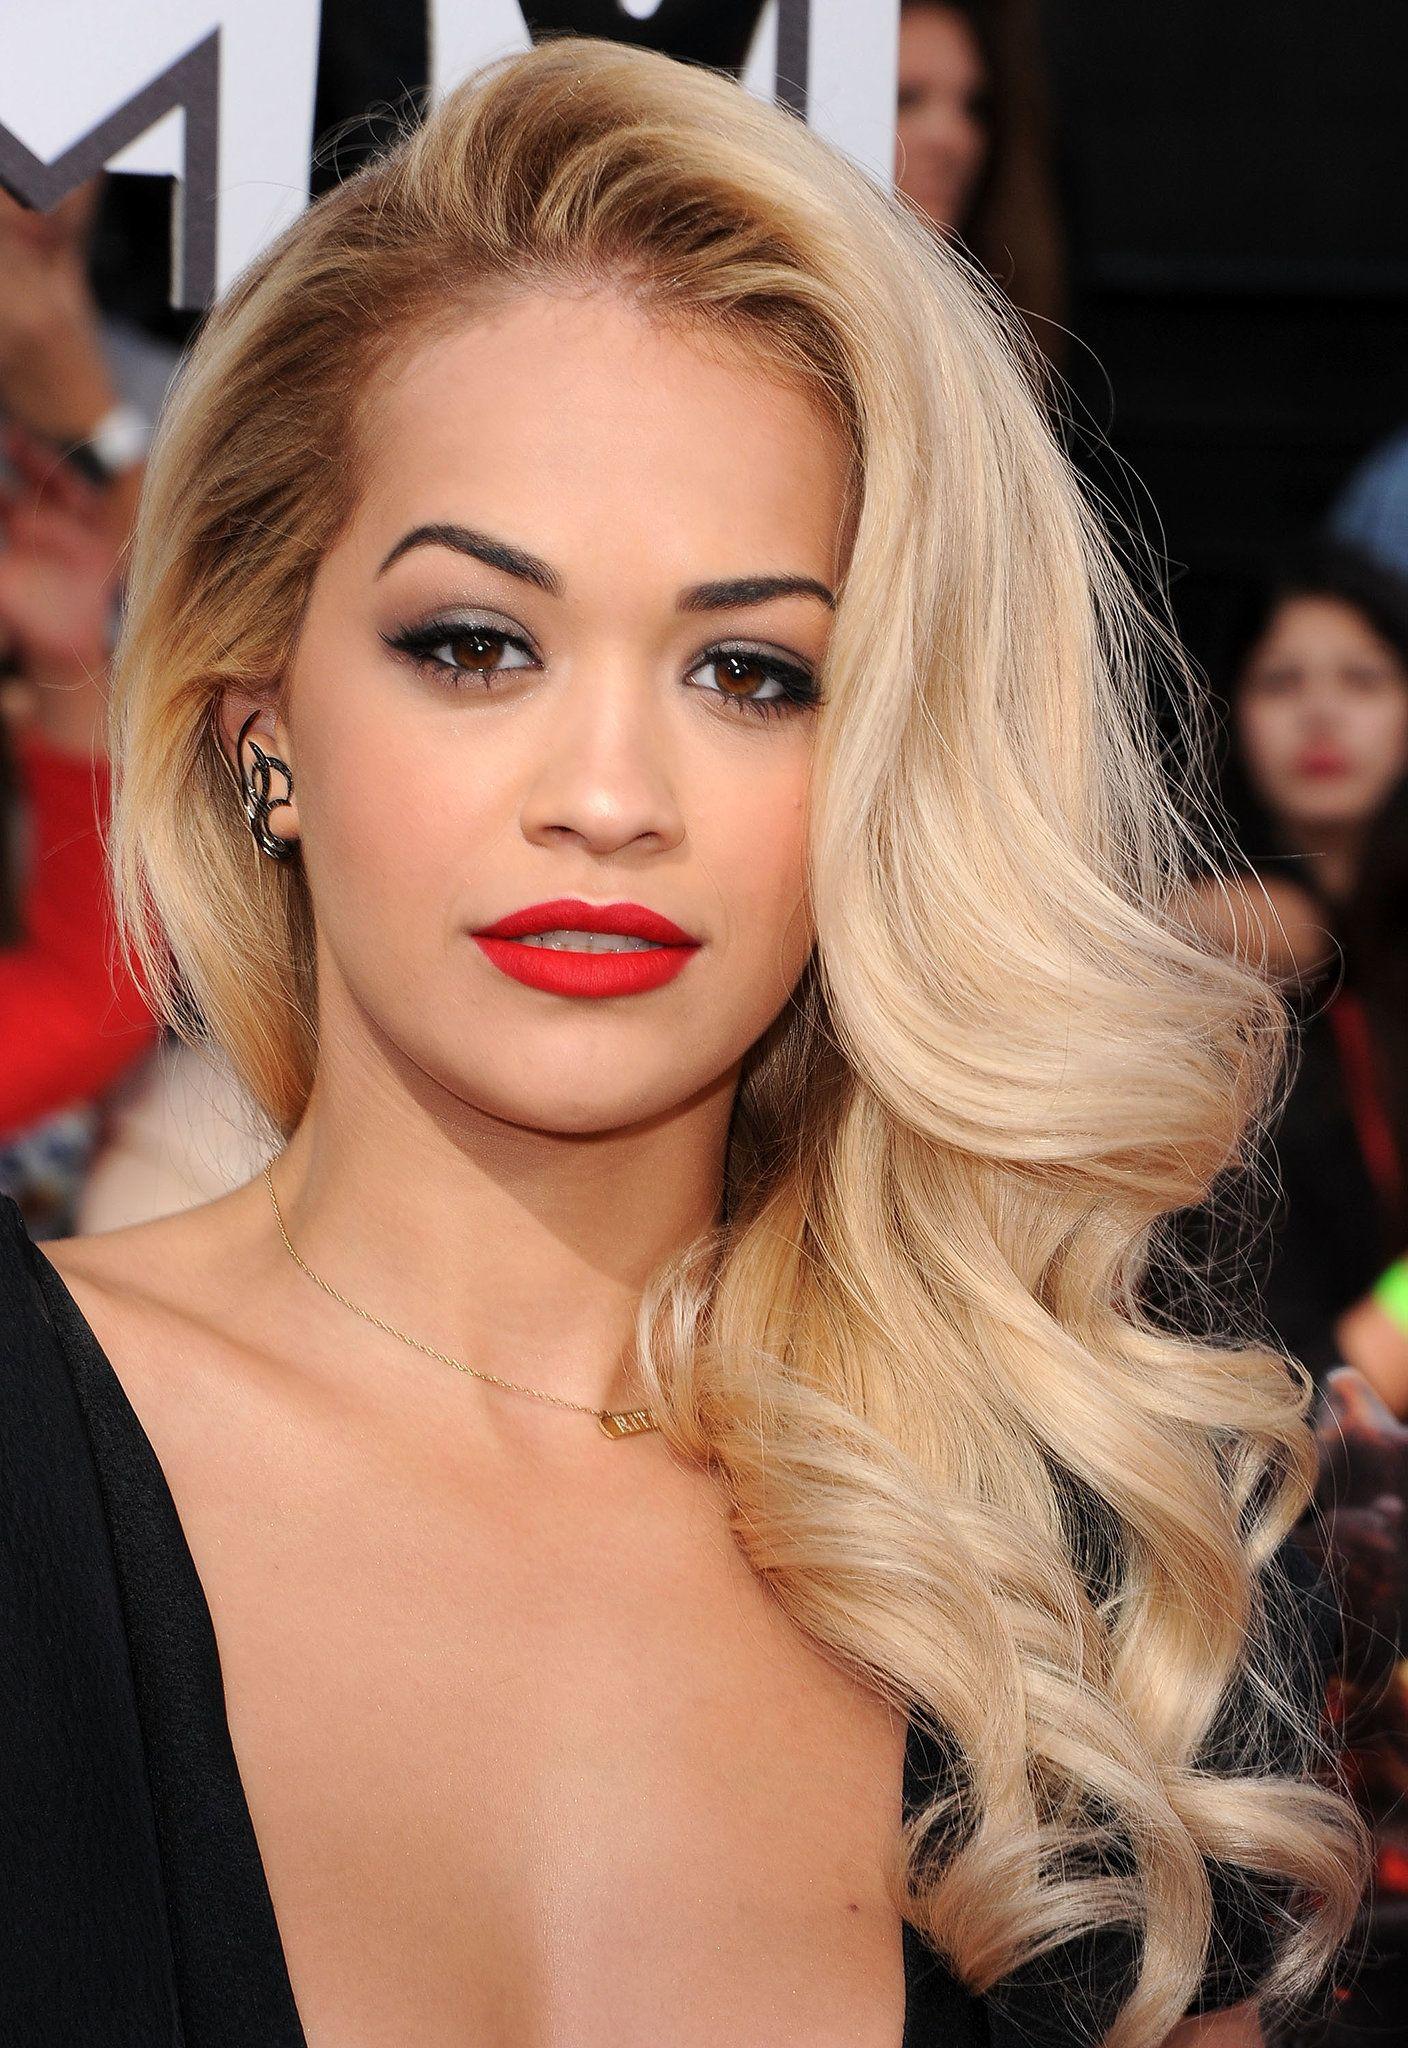 Rita Ora Side Hairstyles Side Swept Hairstyles Hair Styles